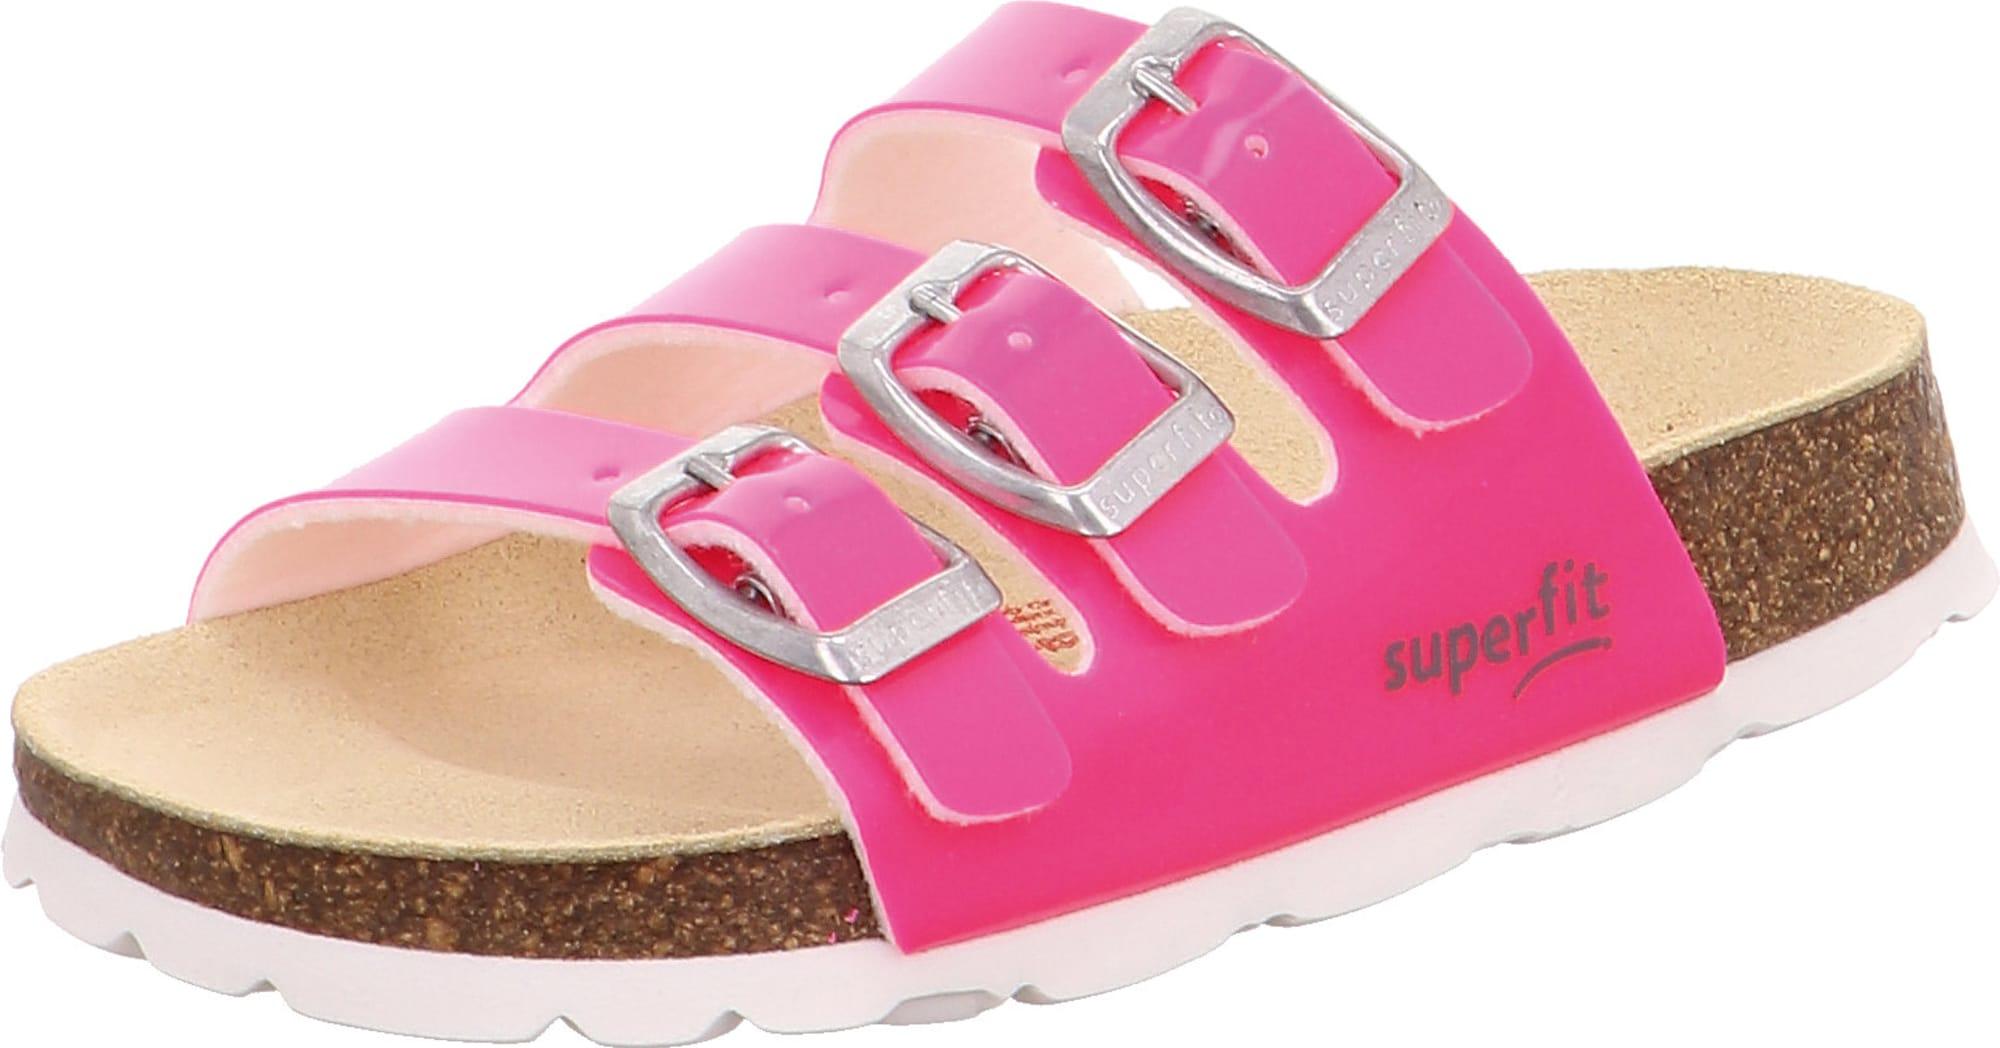 SUPERFIT Sandalai rožinė